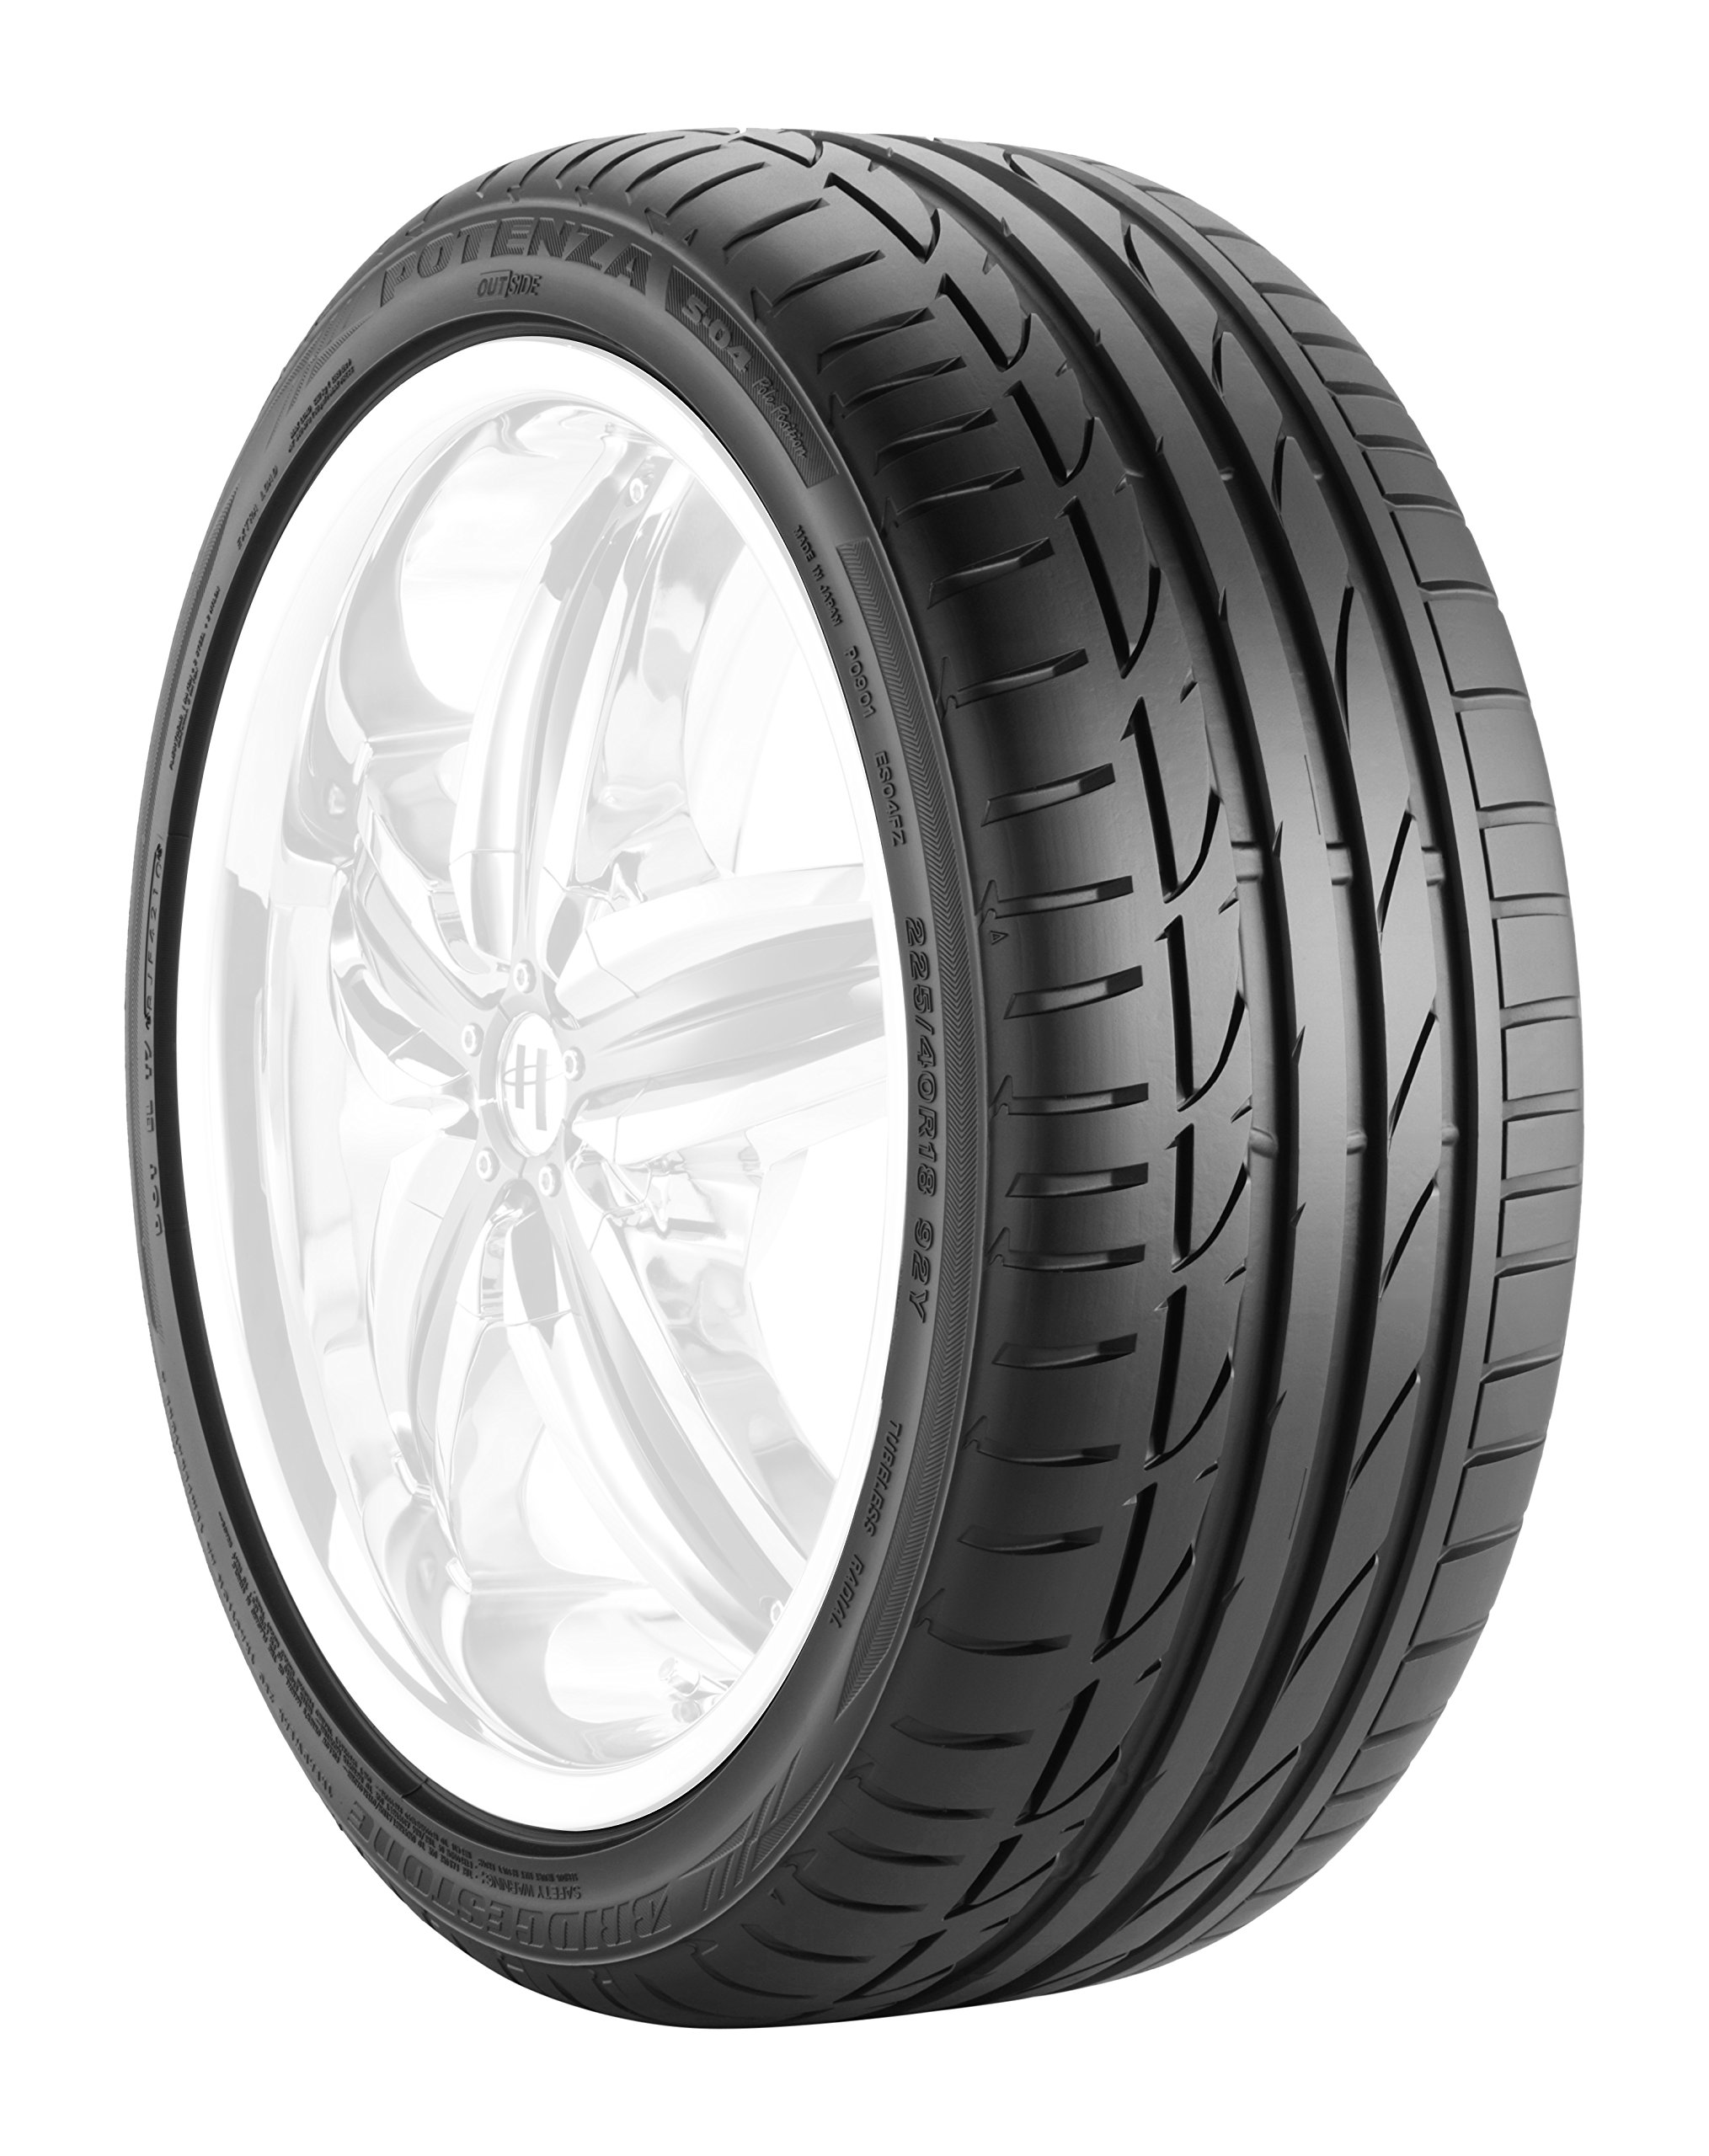 Bridgestone POTENZA S-04 POLE POSITION Performance Radial Tire - 225/50-18 95Y